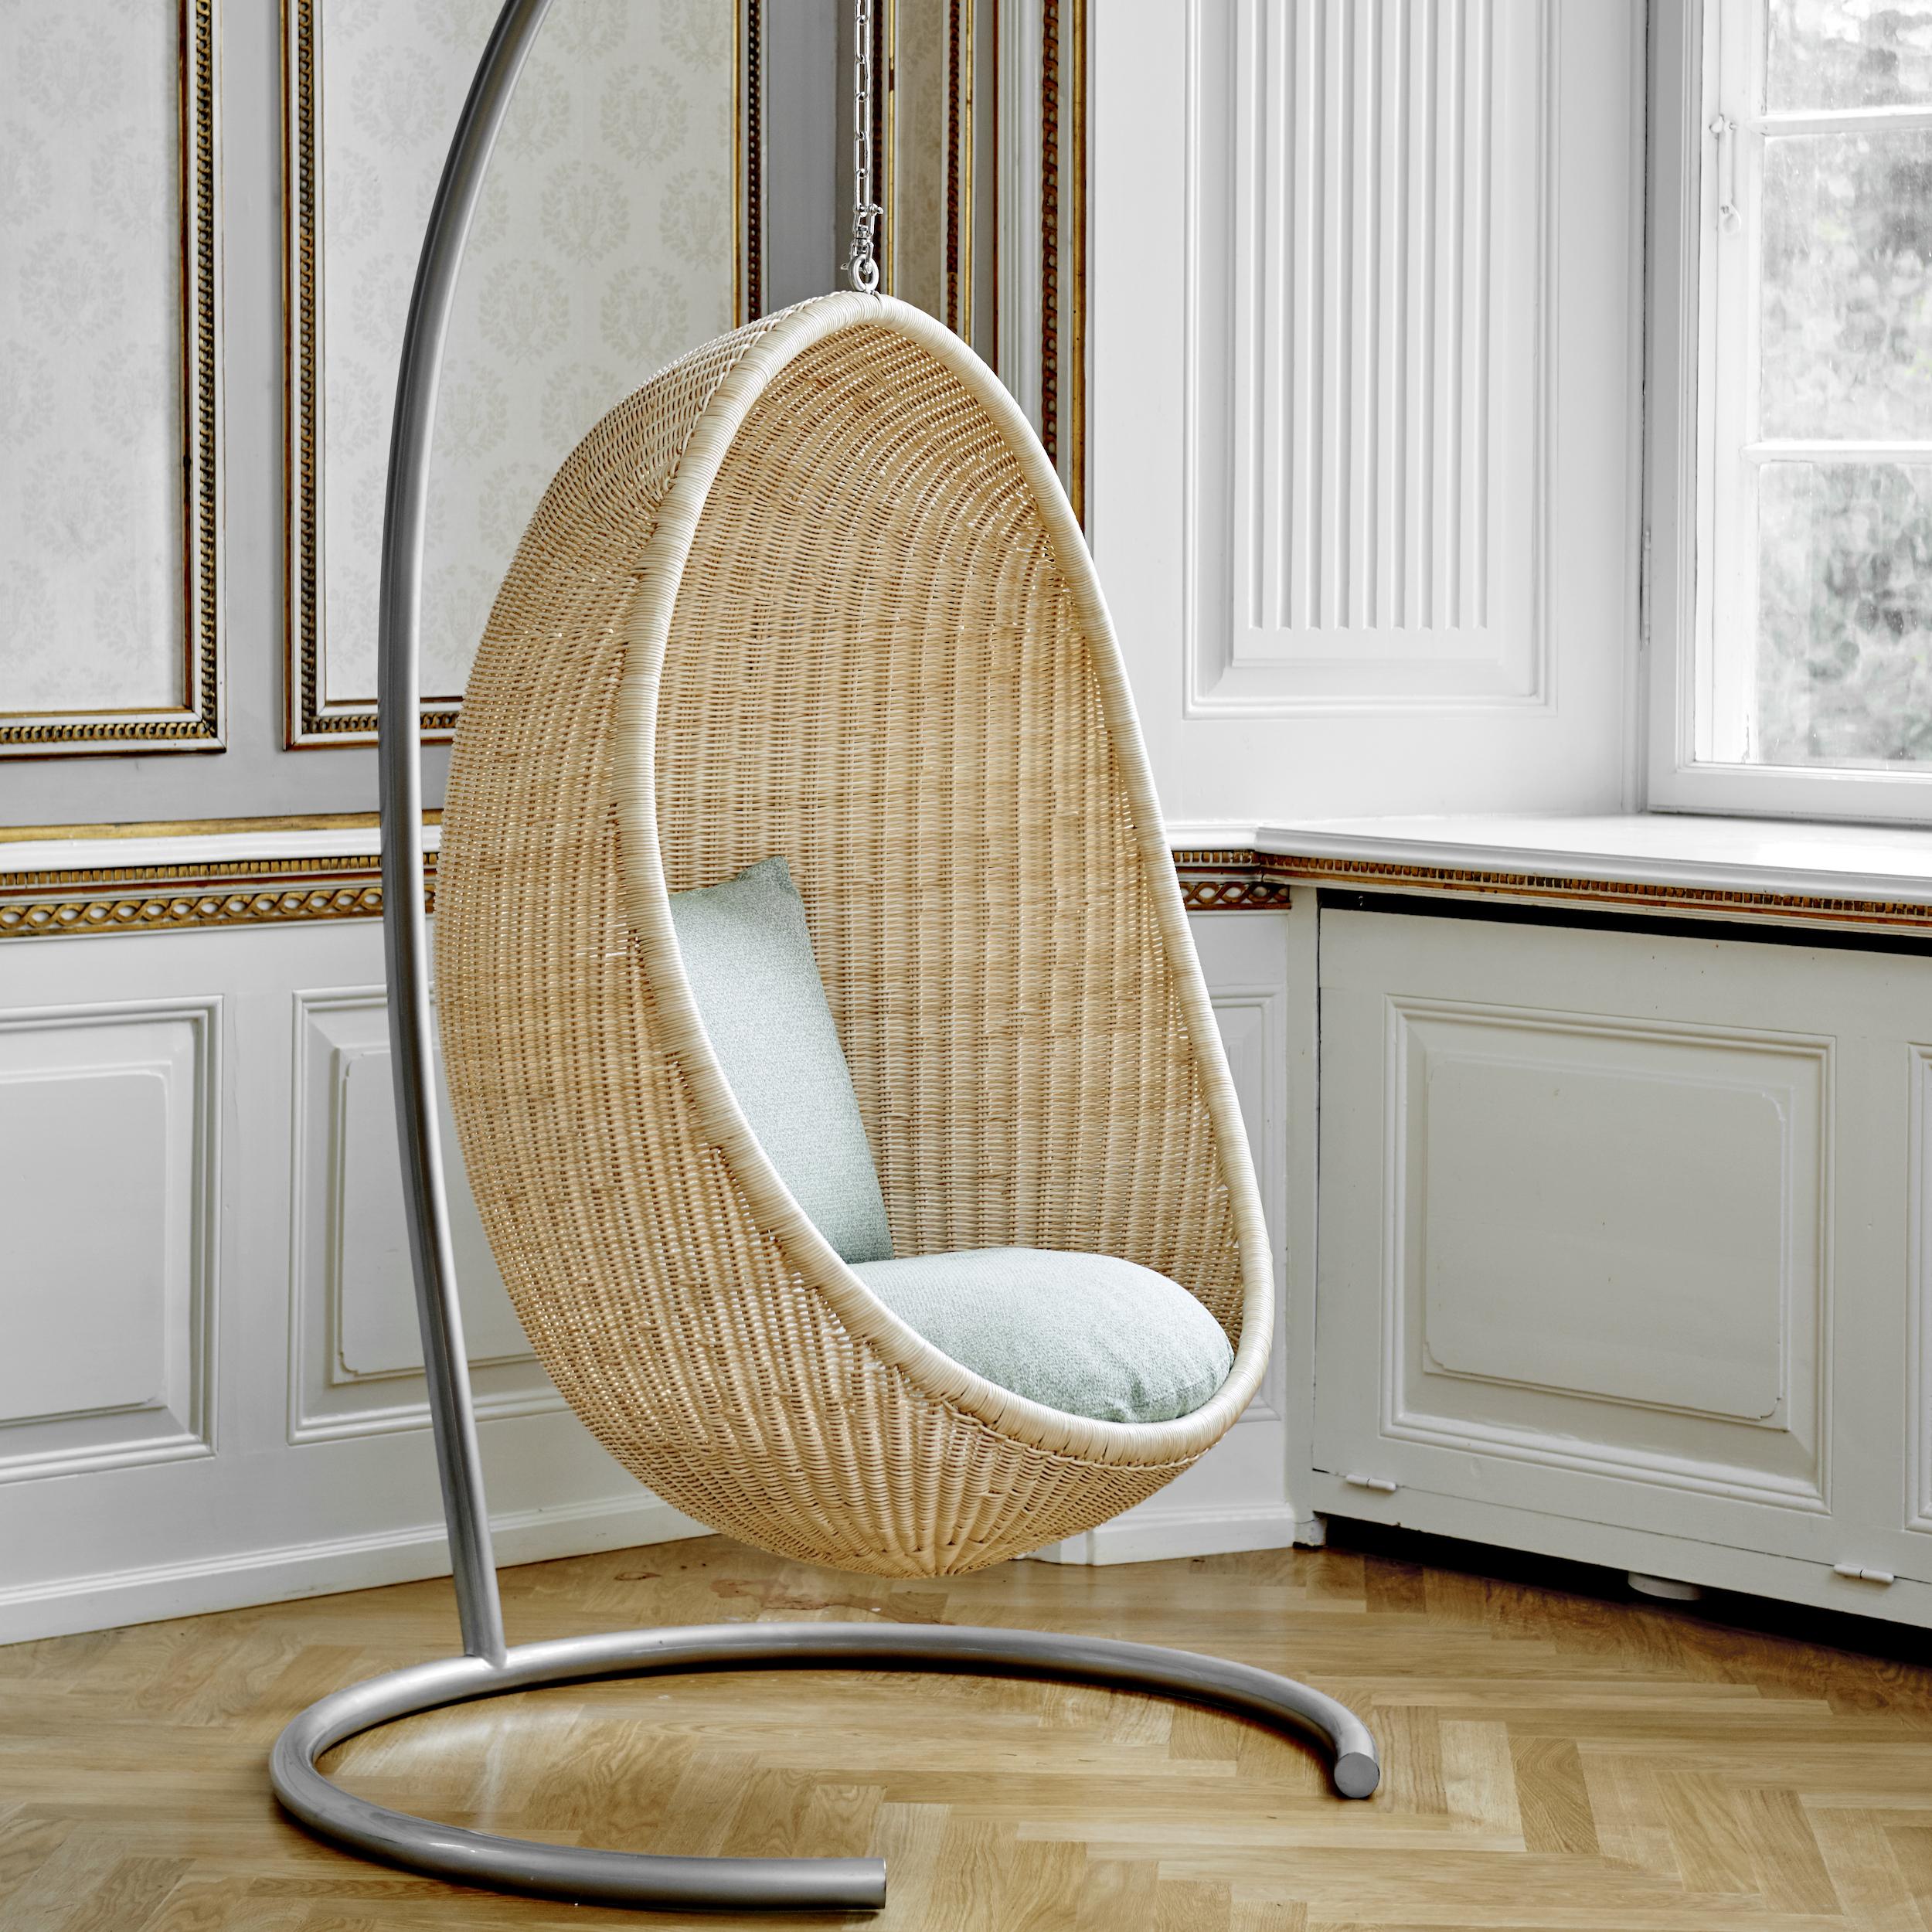 Sika Design Hanging Egg Chair Design Nanna Ditzel 1959